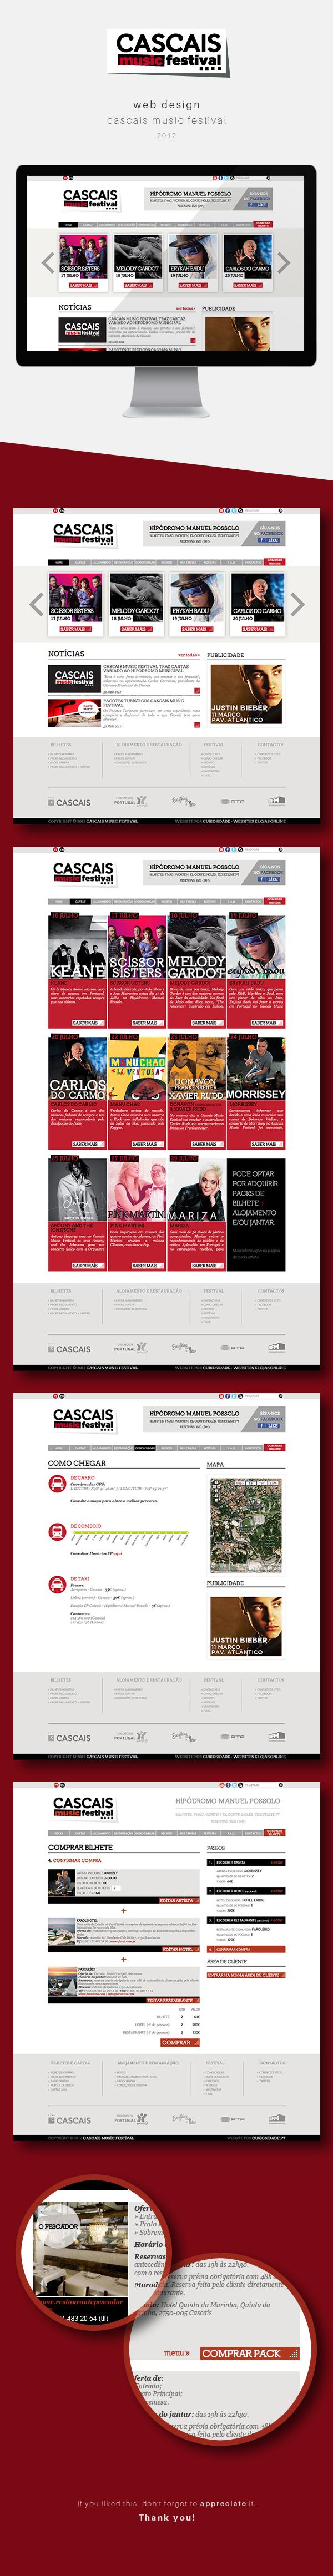 Website Cascais Music Festival by Andrea Sousa, via Behance #webdesign